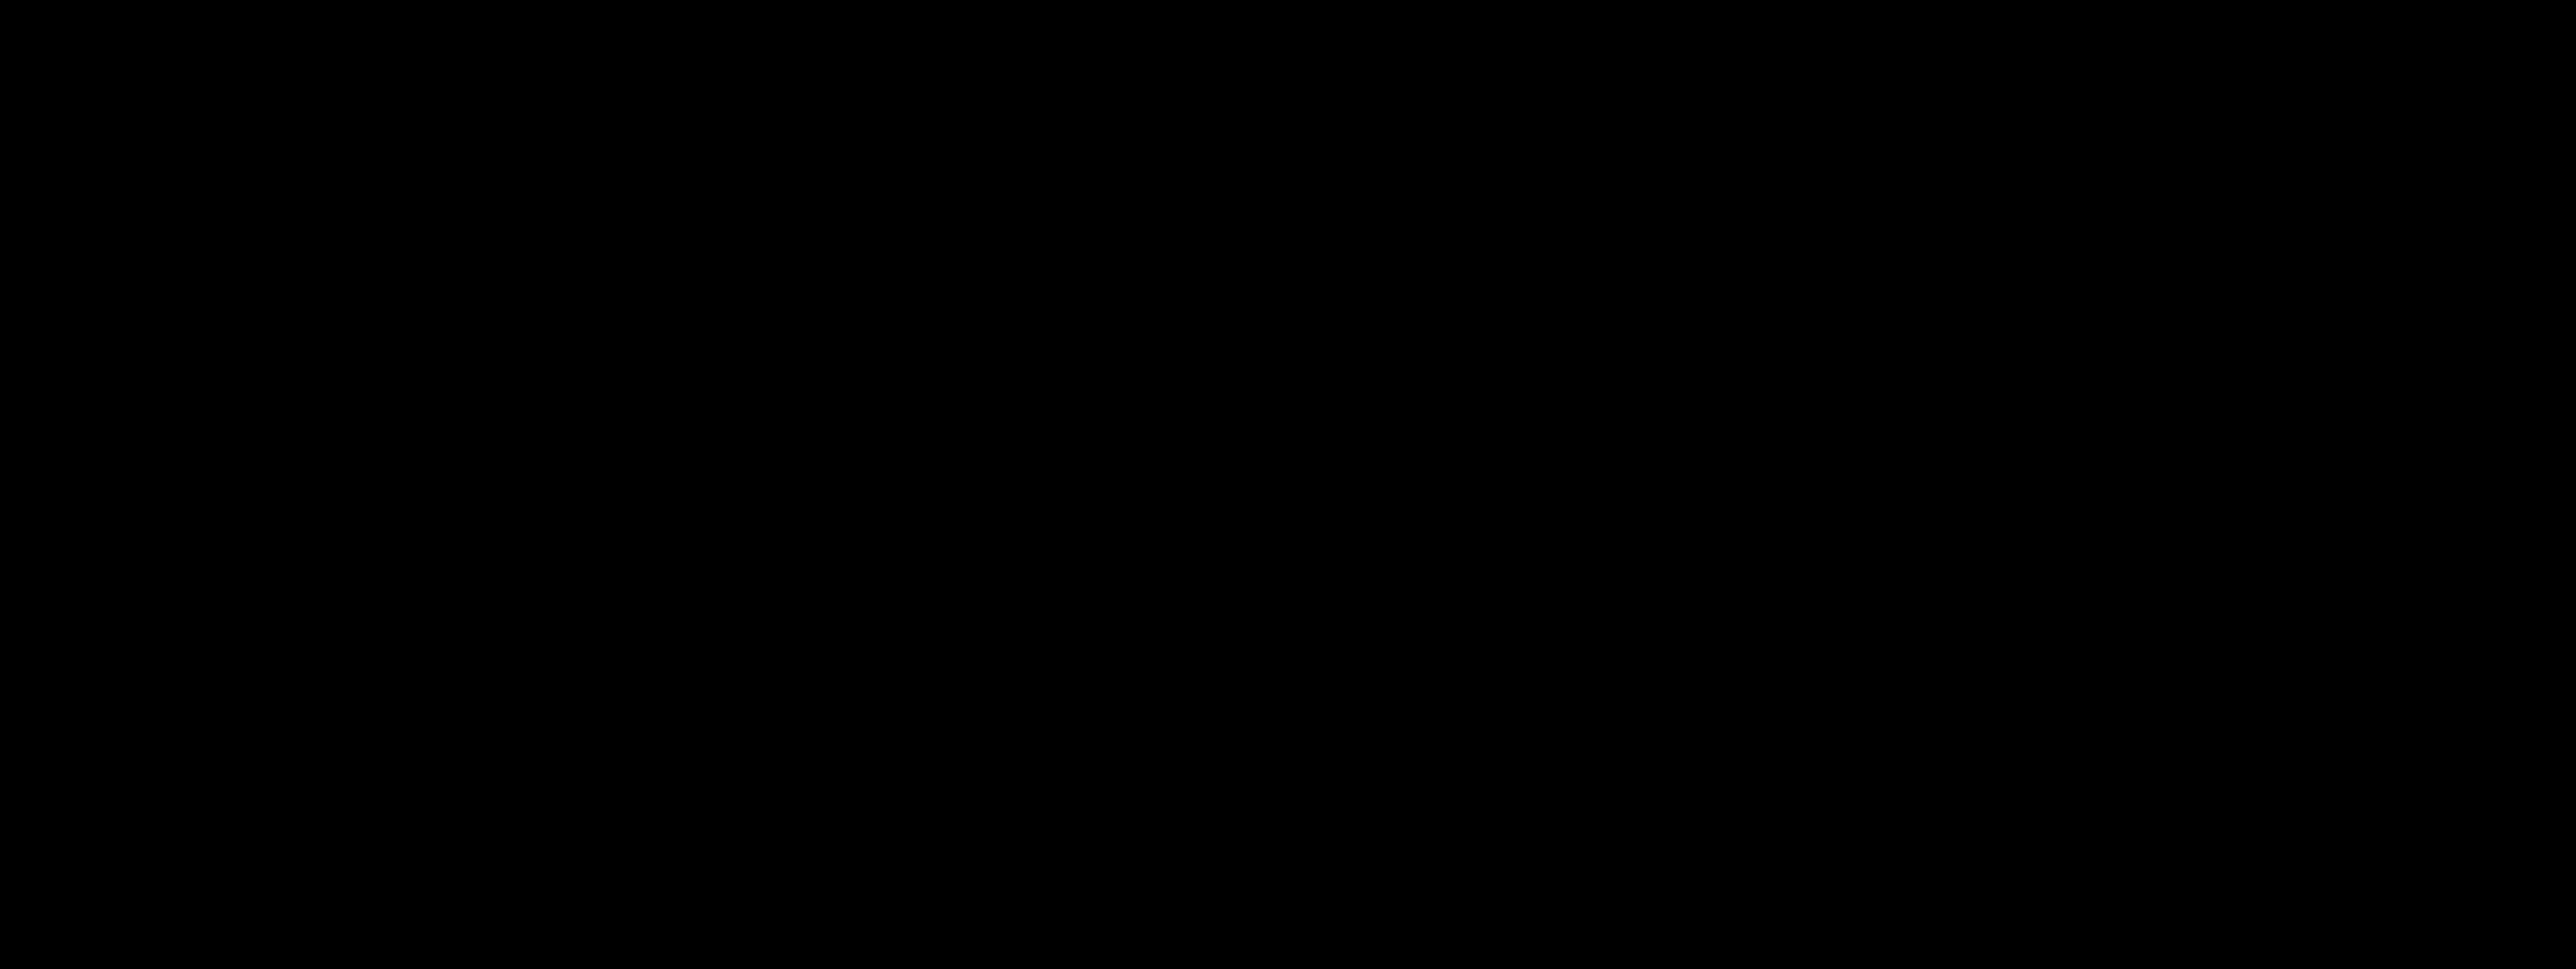 1459790-89-6